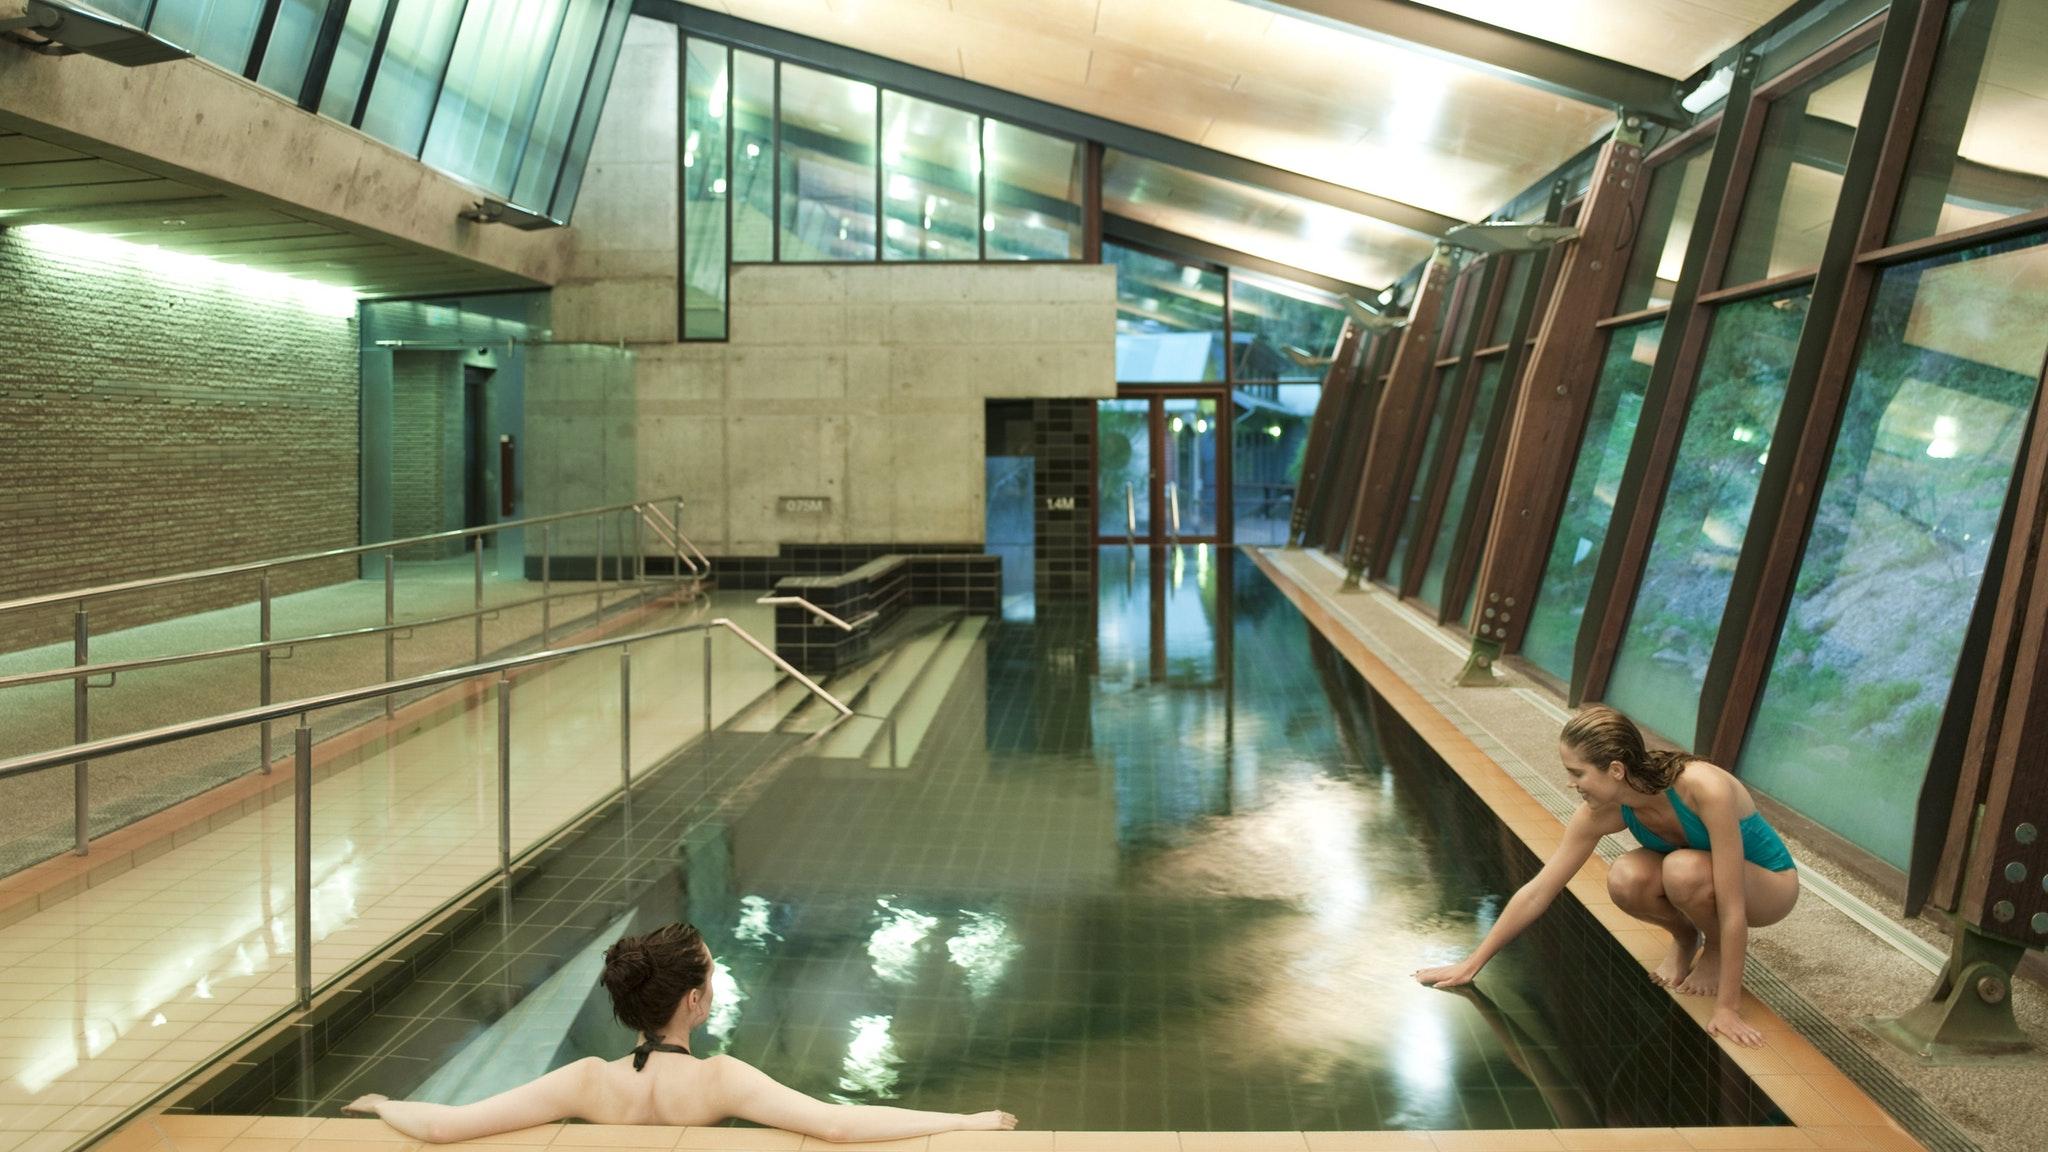 Bathhouse Relaxation Pool